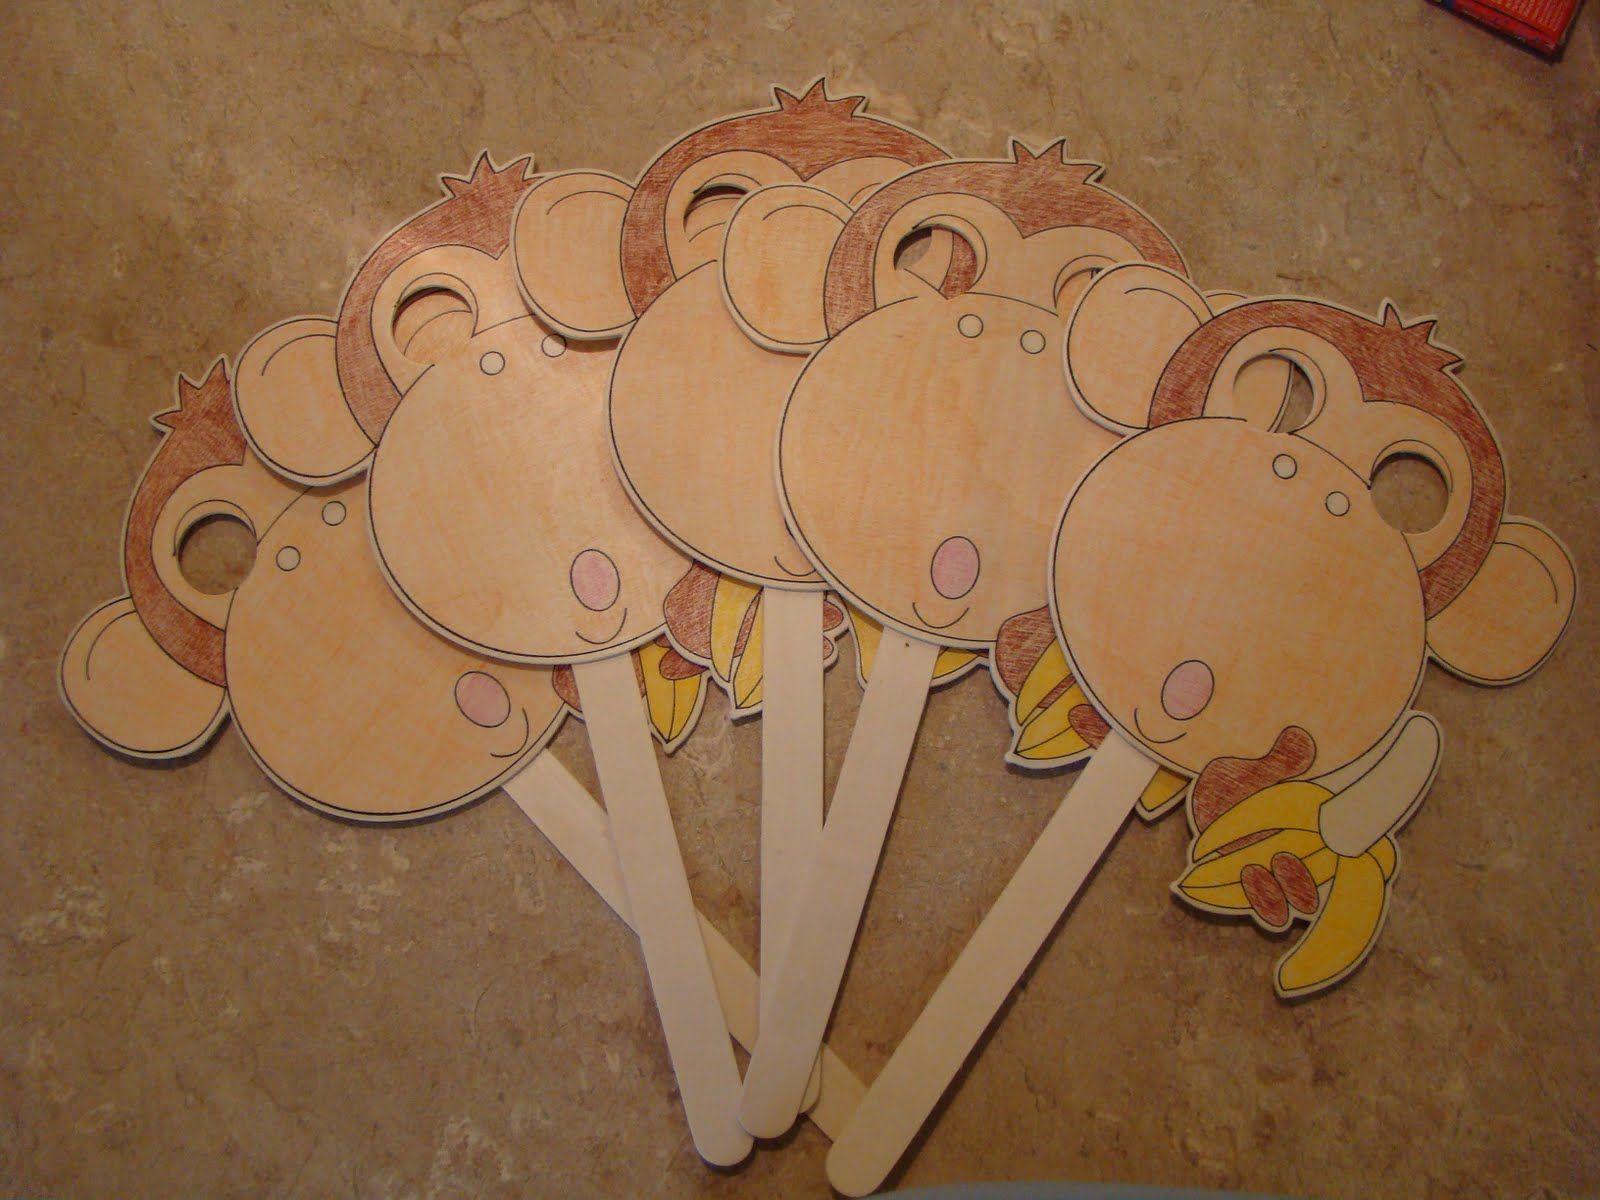 What Have I Done Now 5 Little Monkeys Masks